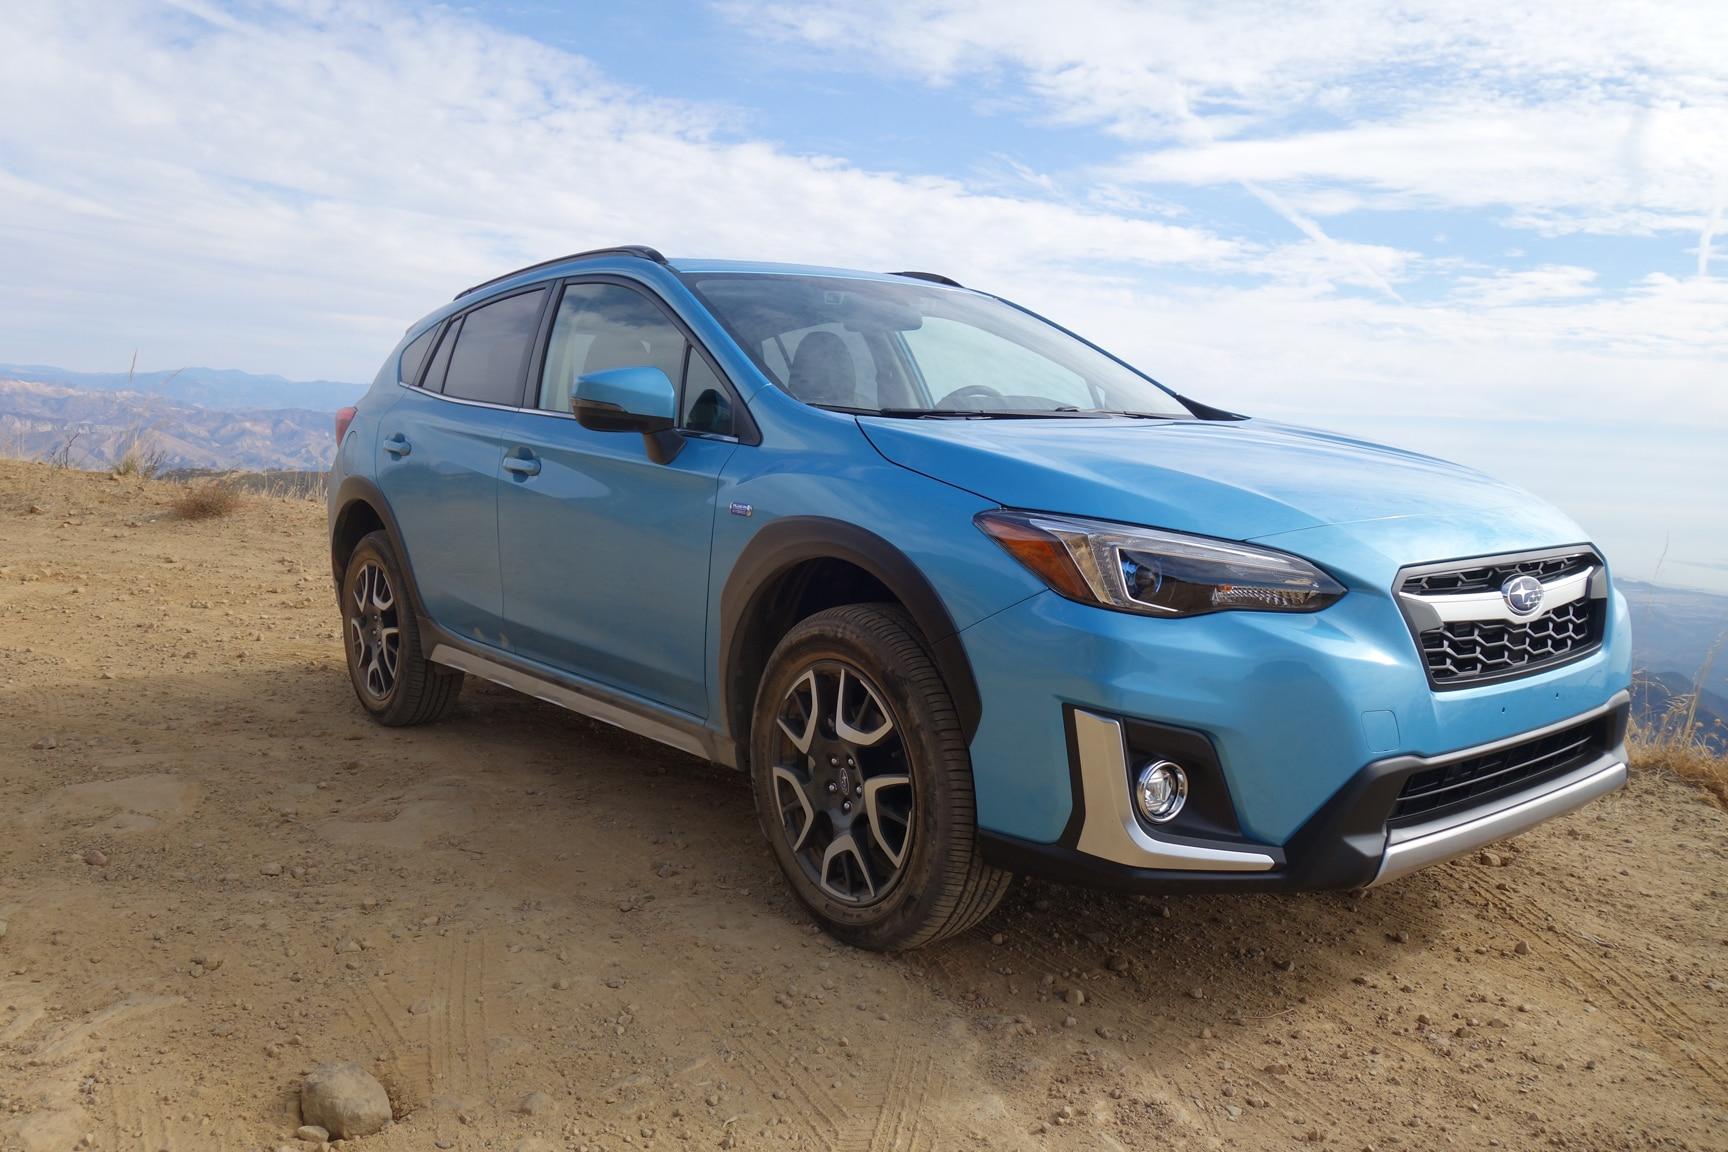 2019 Subaru Crosstrek Hybrid Photo Gallery | Automobile ...